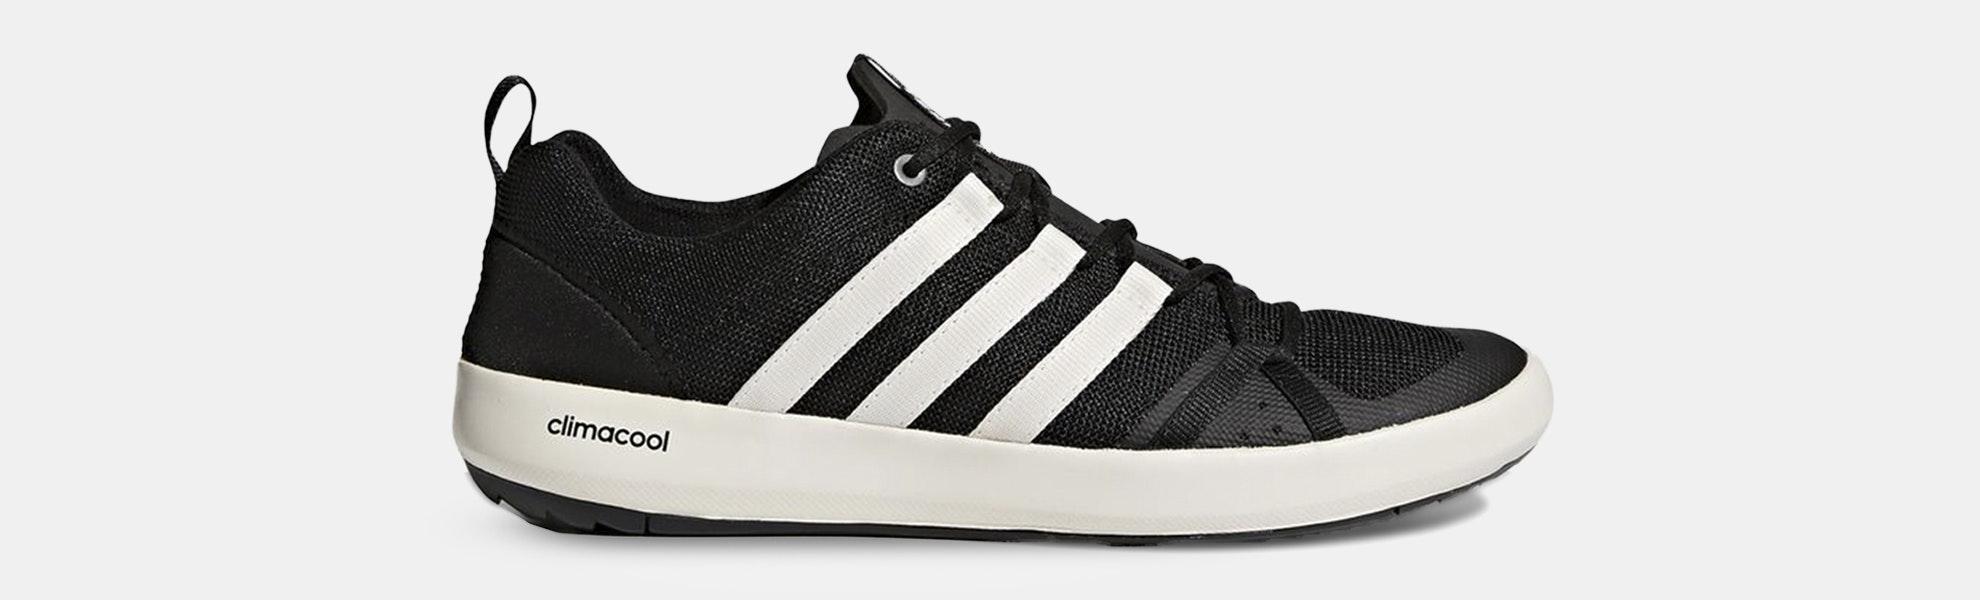 Adidas Men's Terrex & Women's Sleek Boat Shoes